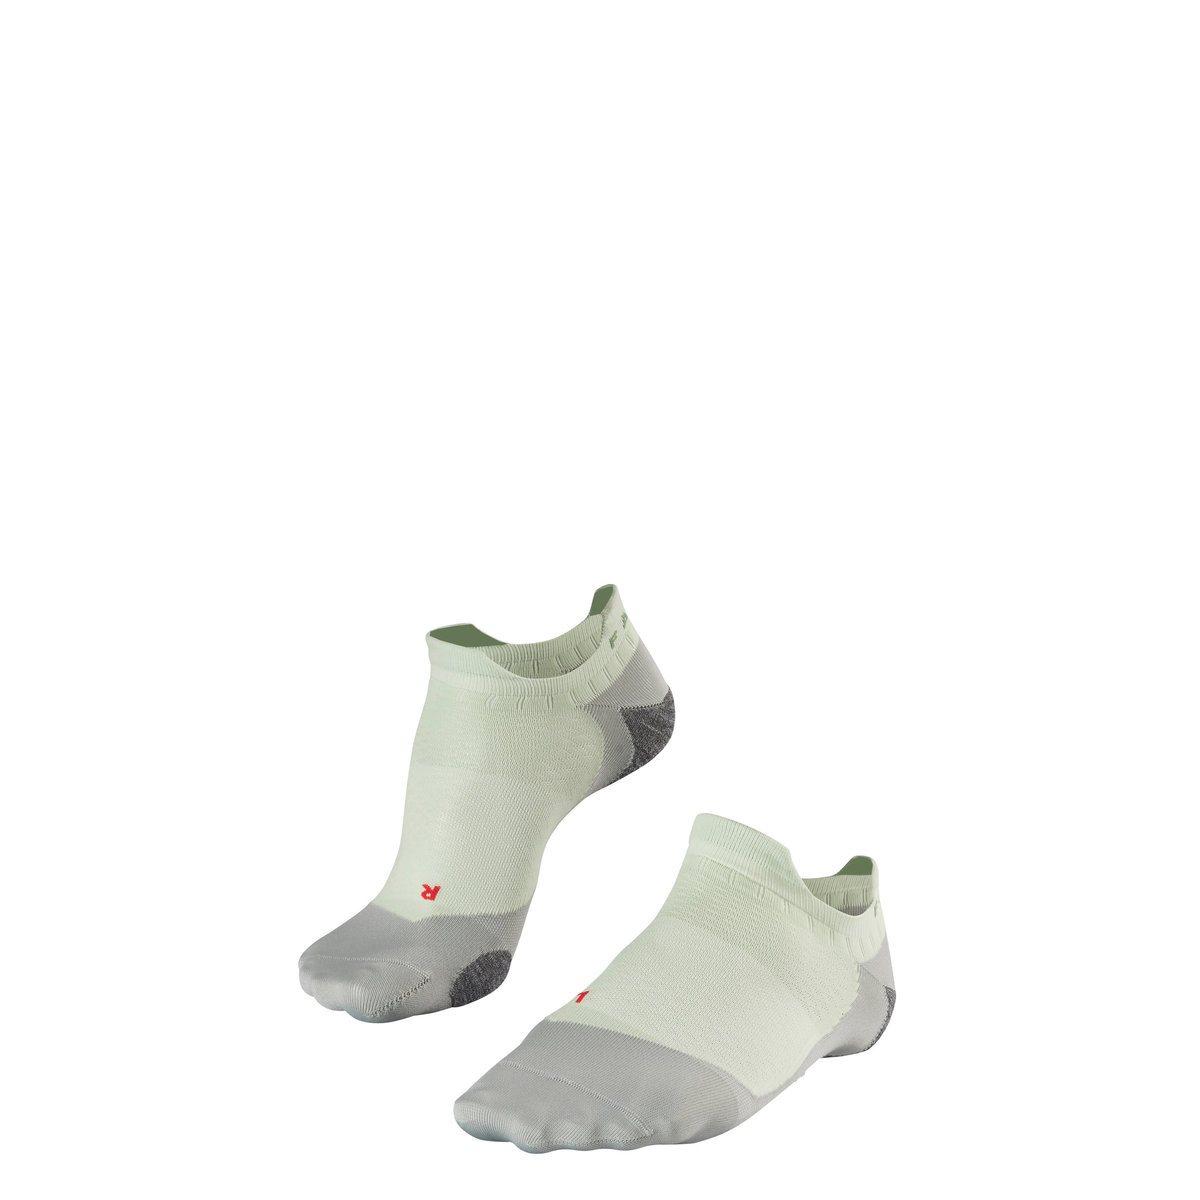 Falke RU5 INVISIBLE, muške čarape za trčanje